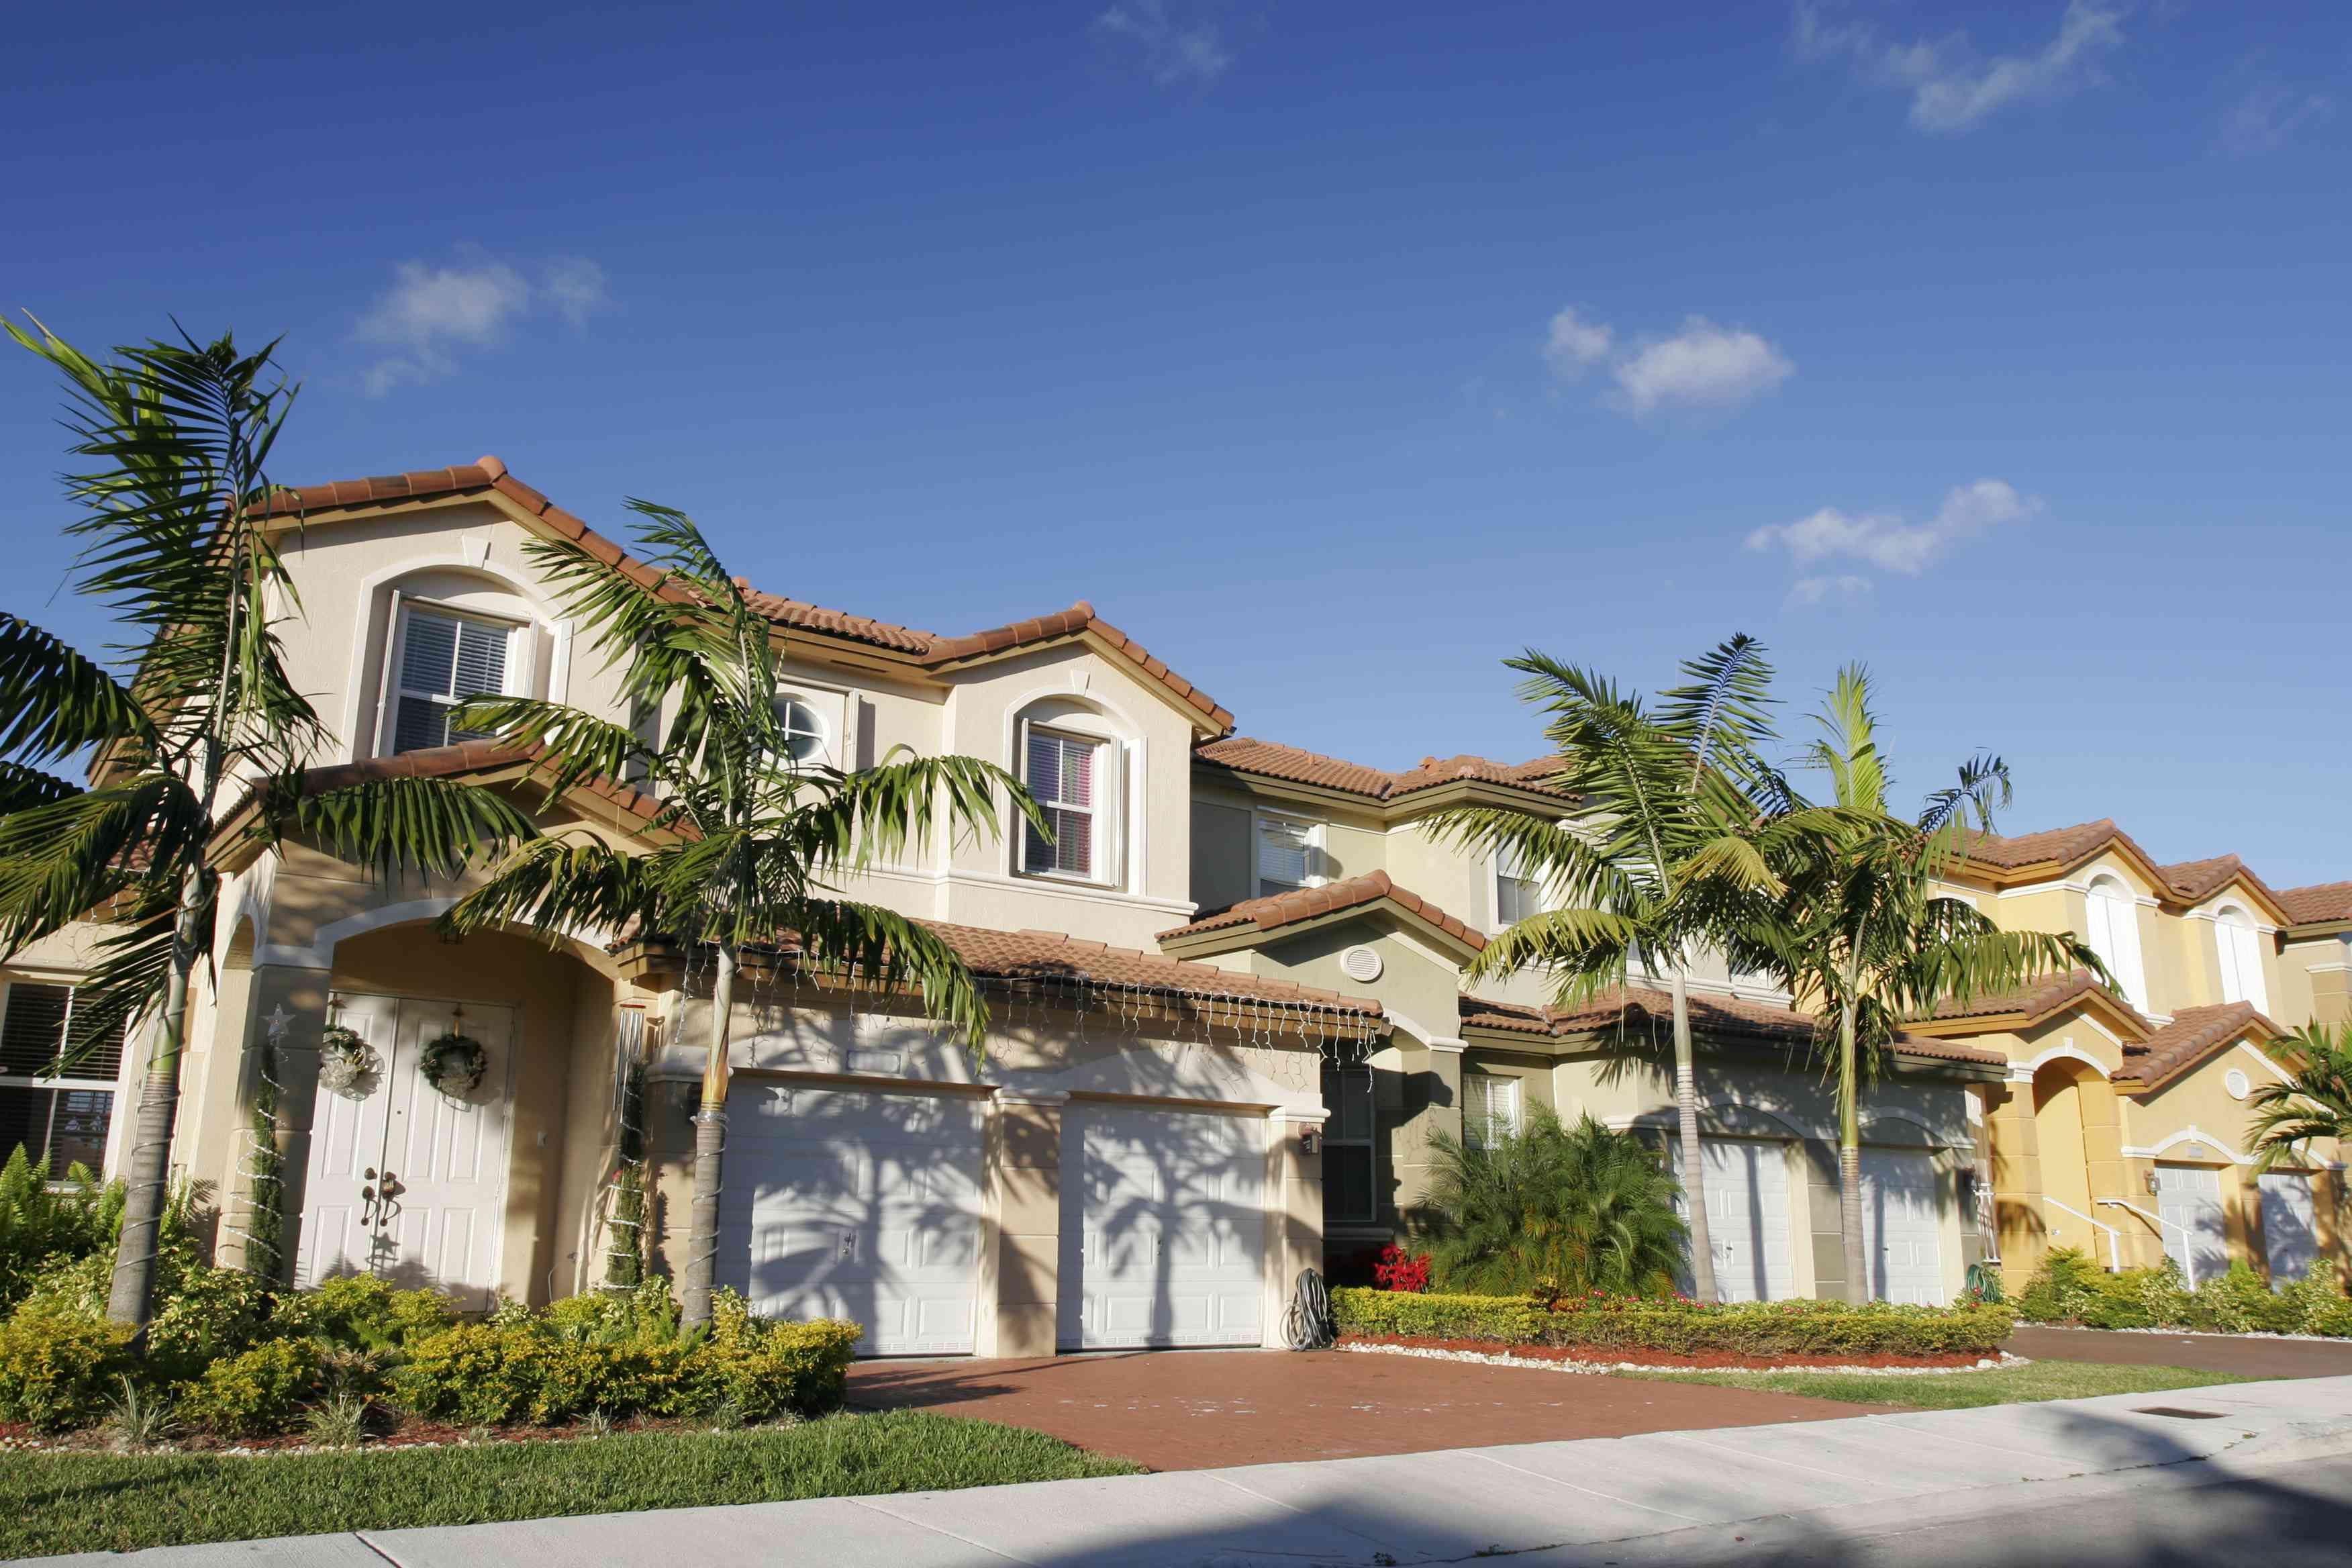 popular home styles - mediterranean style home